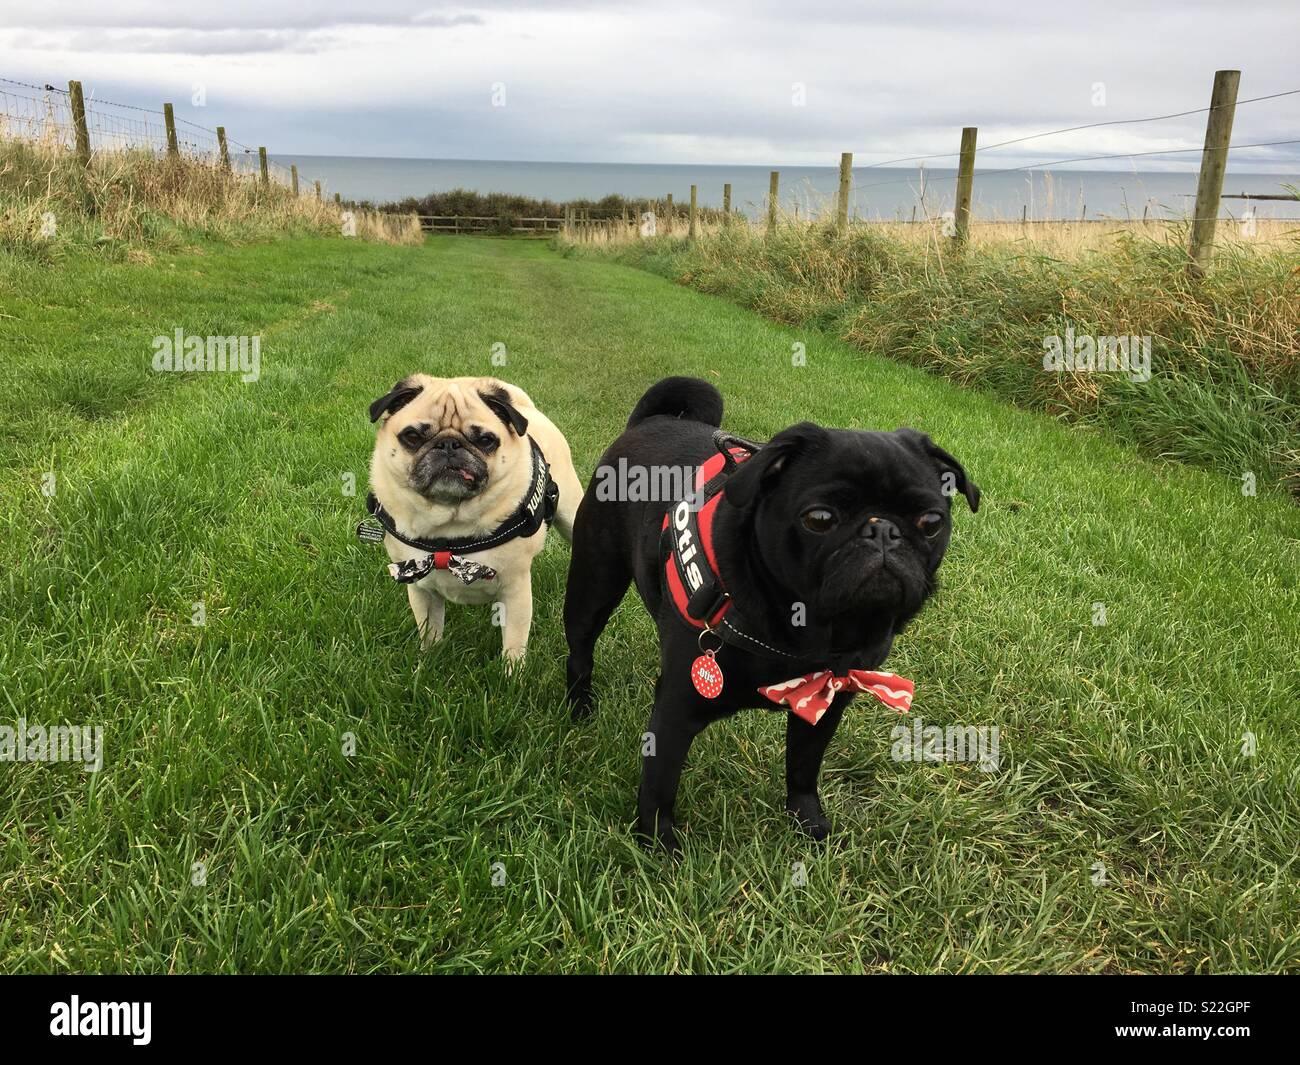 Pugs on tour - Stock Image